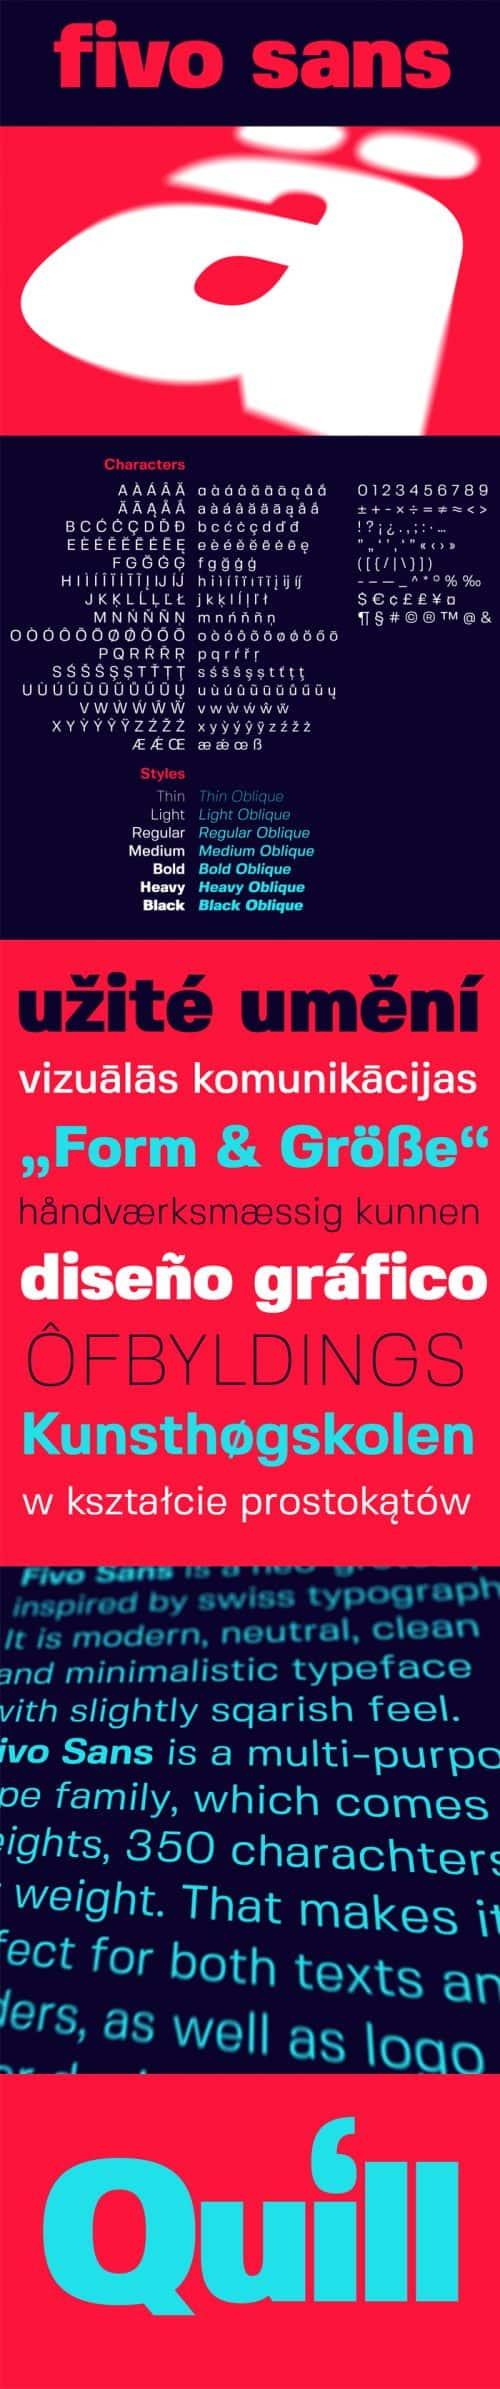 Download the Fivo Sans Typeface